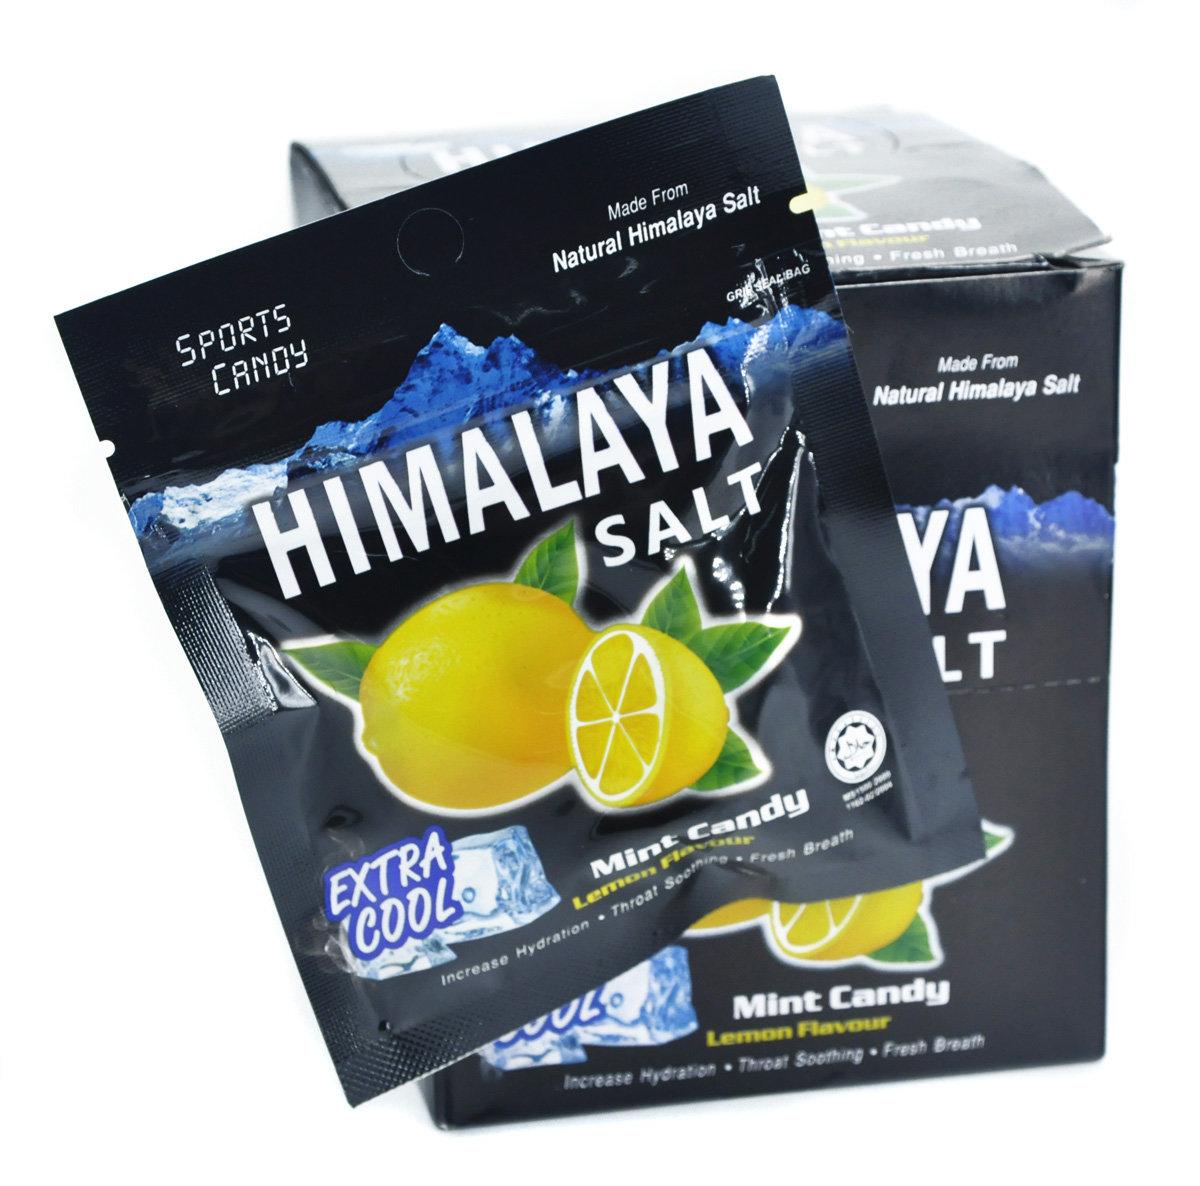 Big Foot | Himalaya Salt Mint Candy - Lemon Flv  | HKTVmall